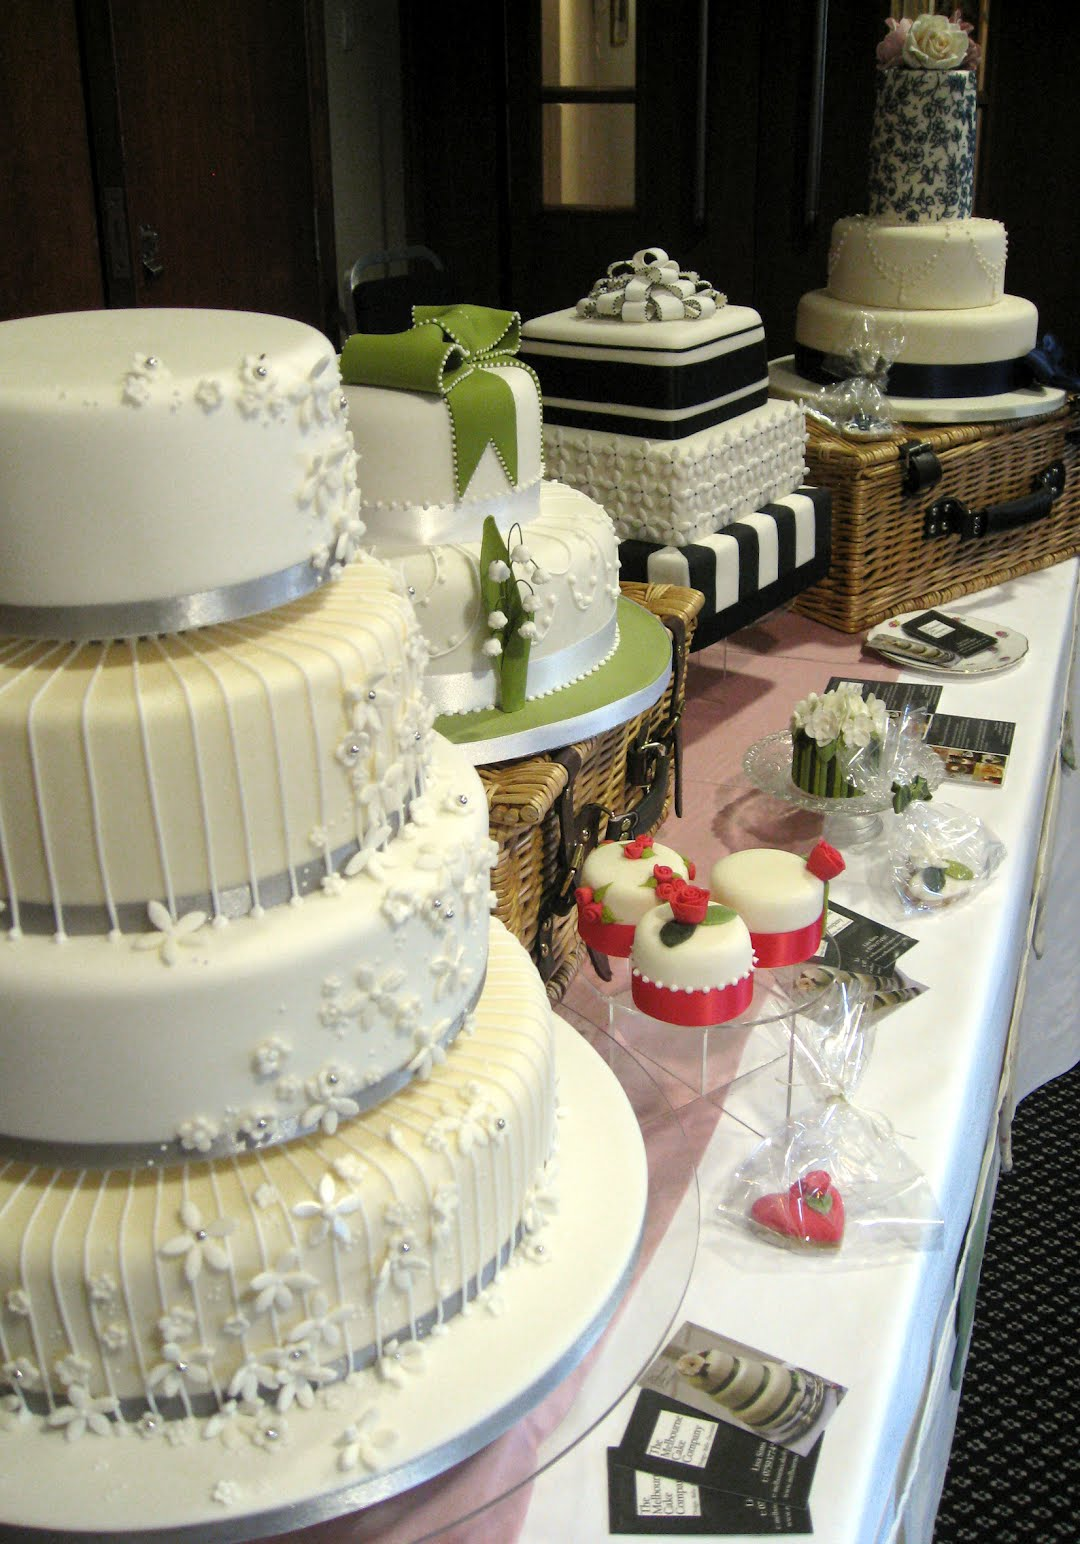 11 Photos of Bridal Cakes Inc